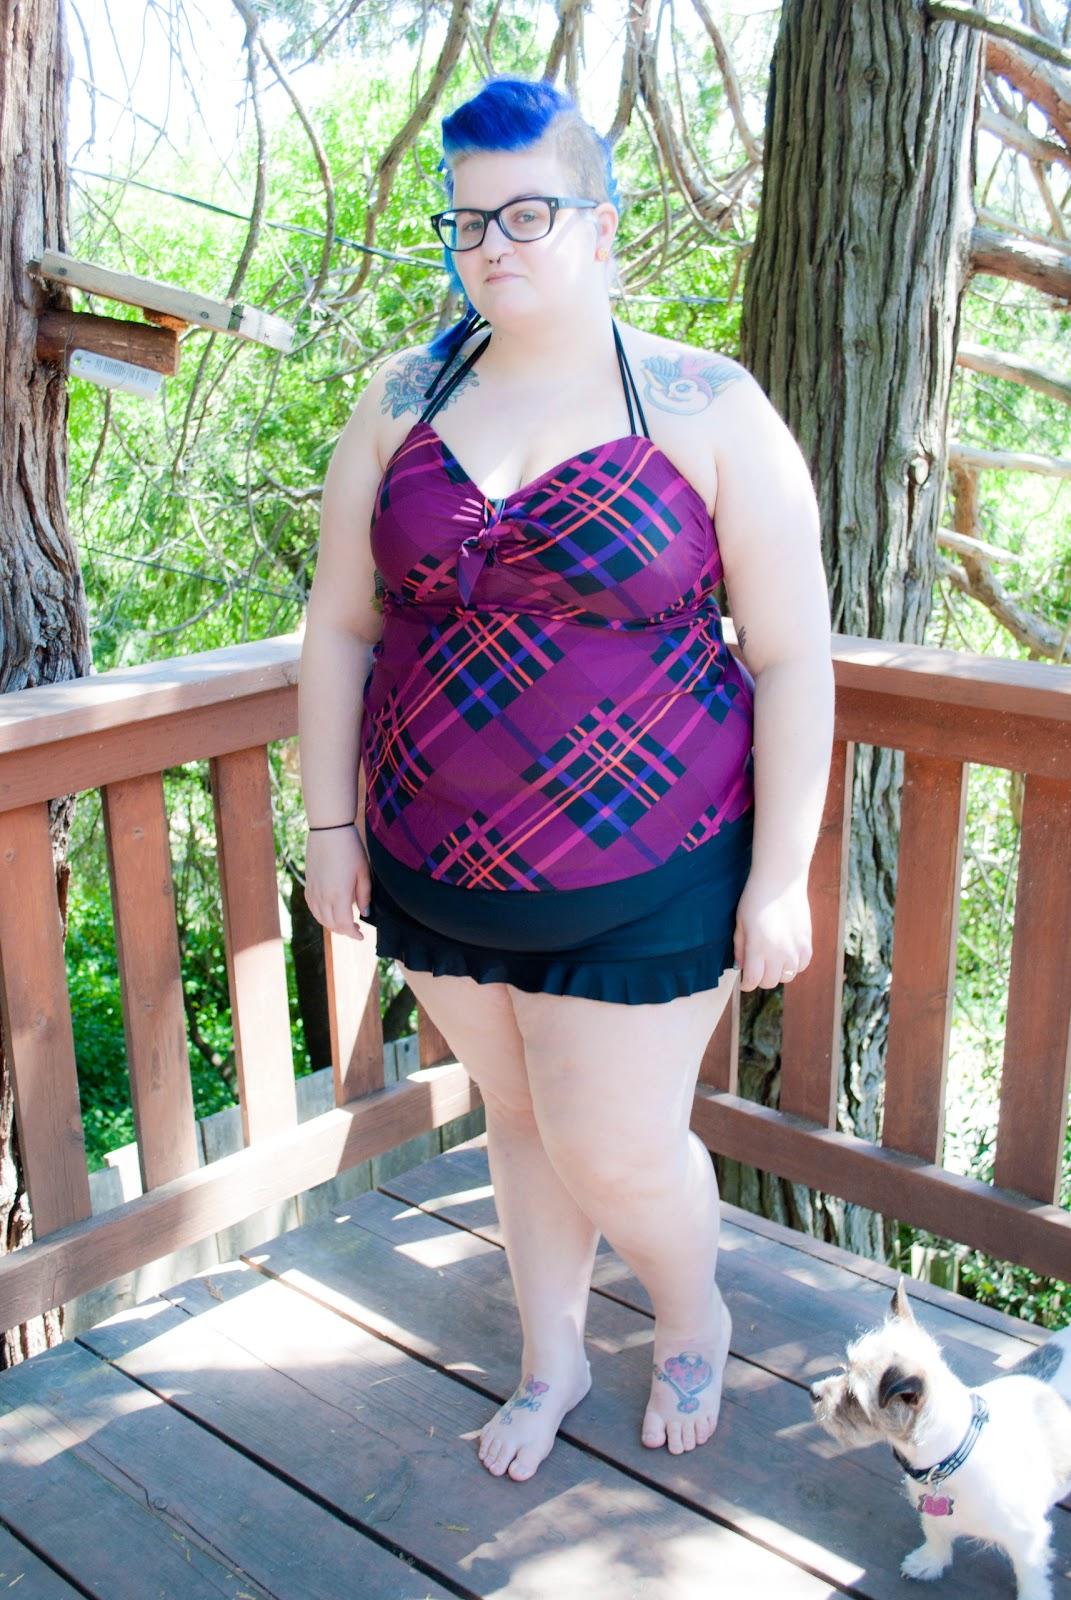 woman Chubby cute